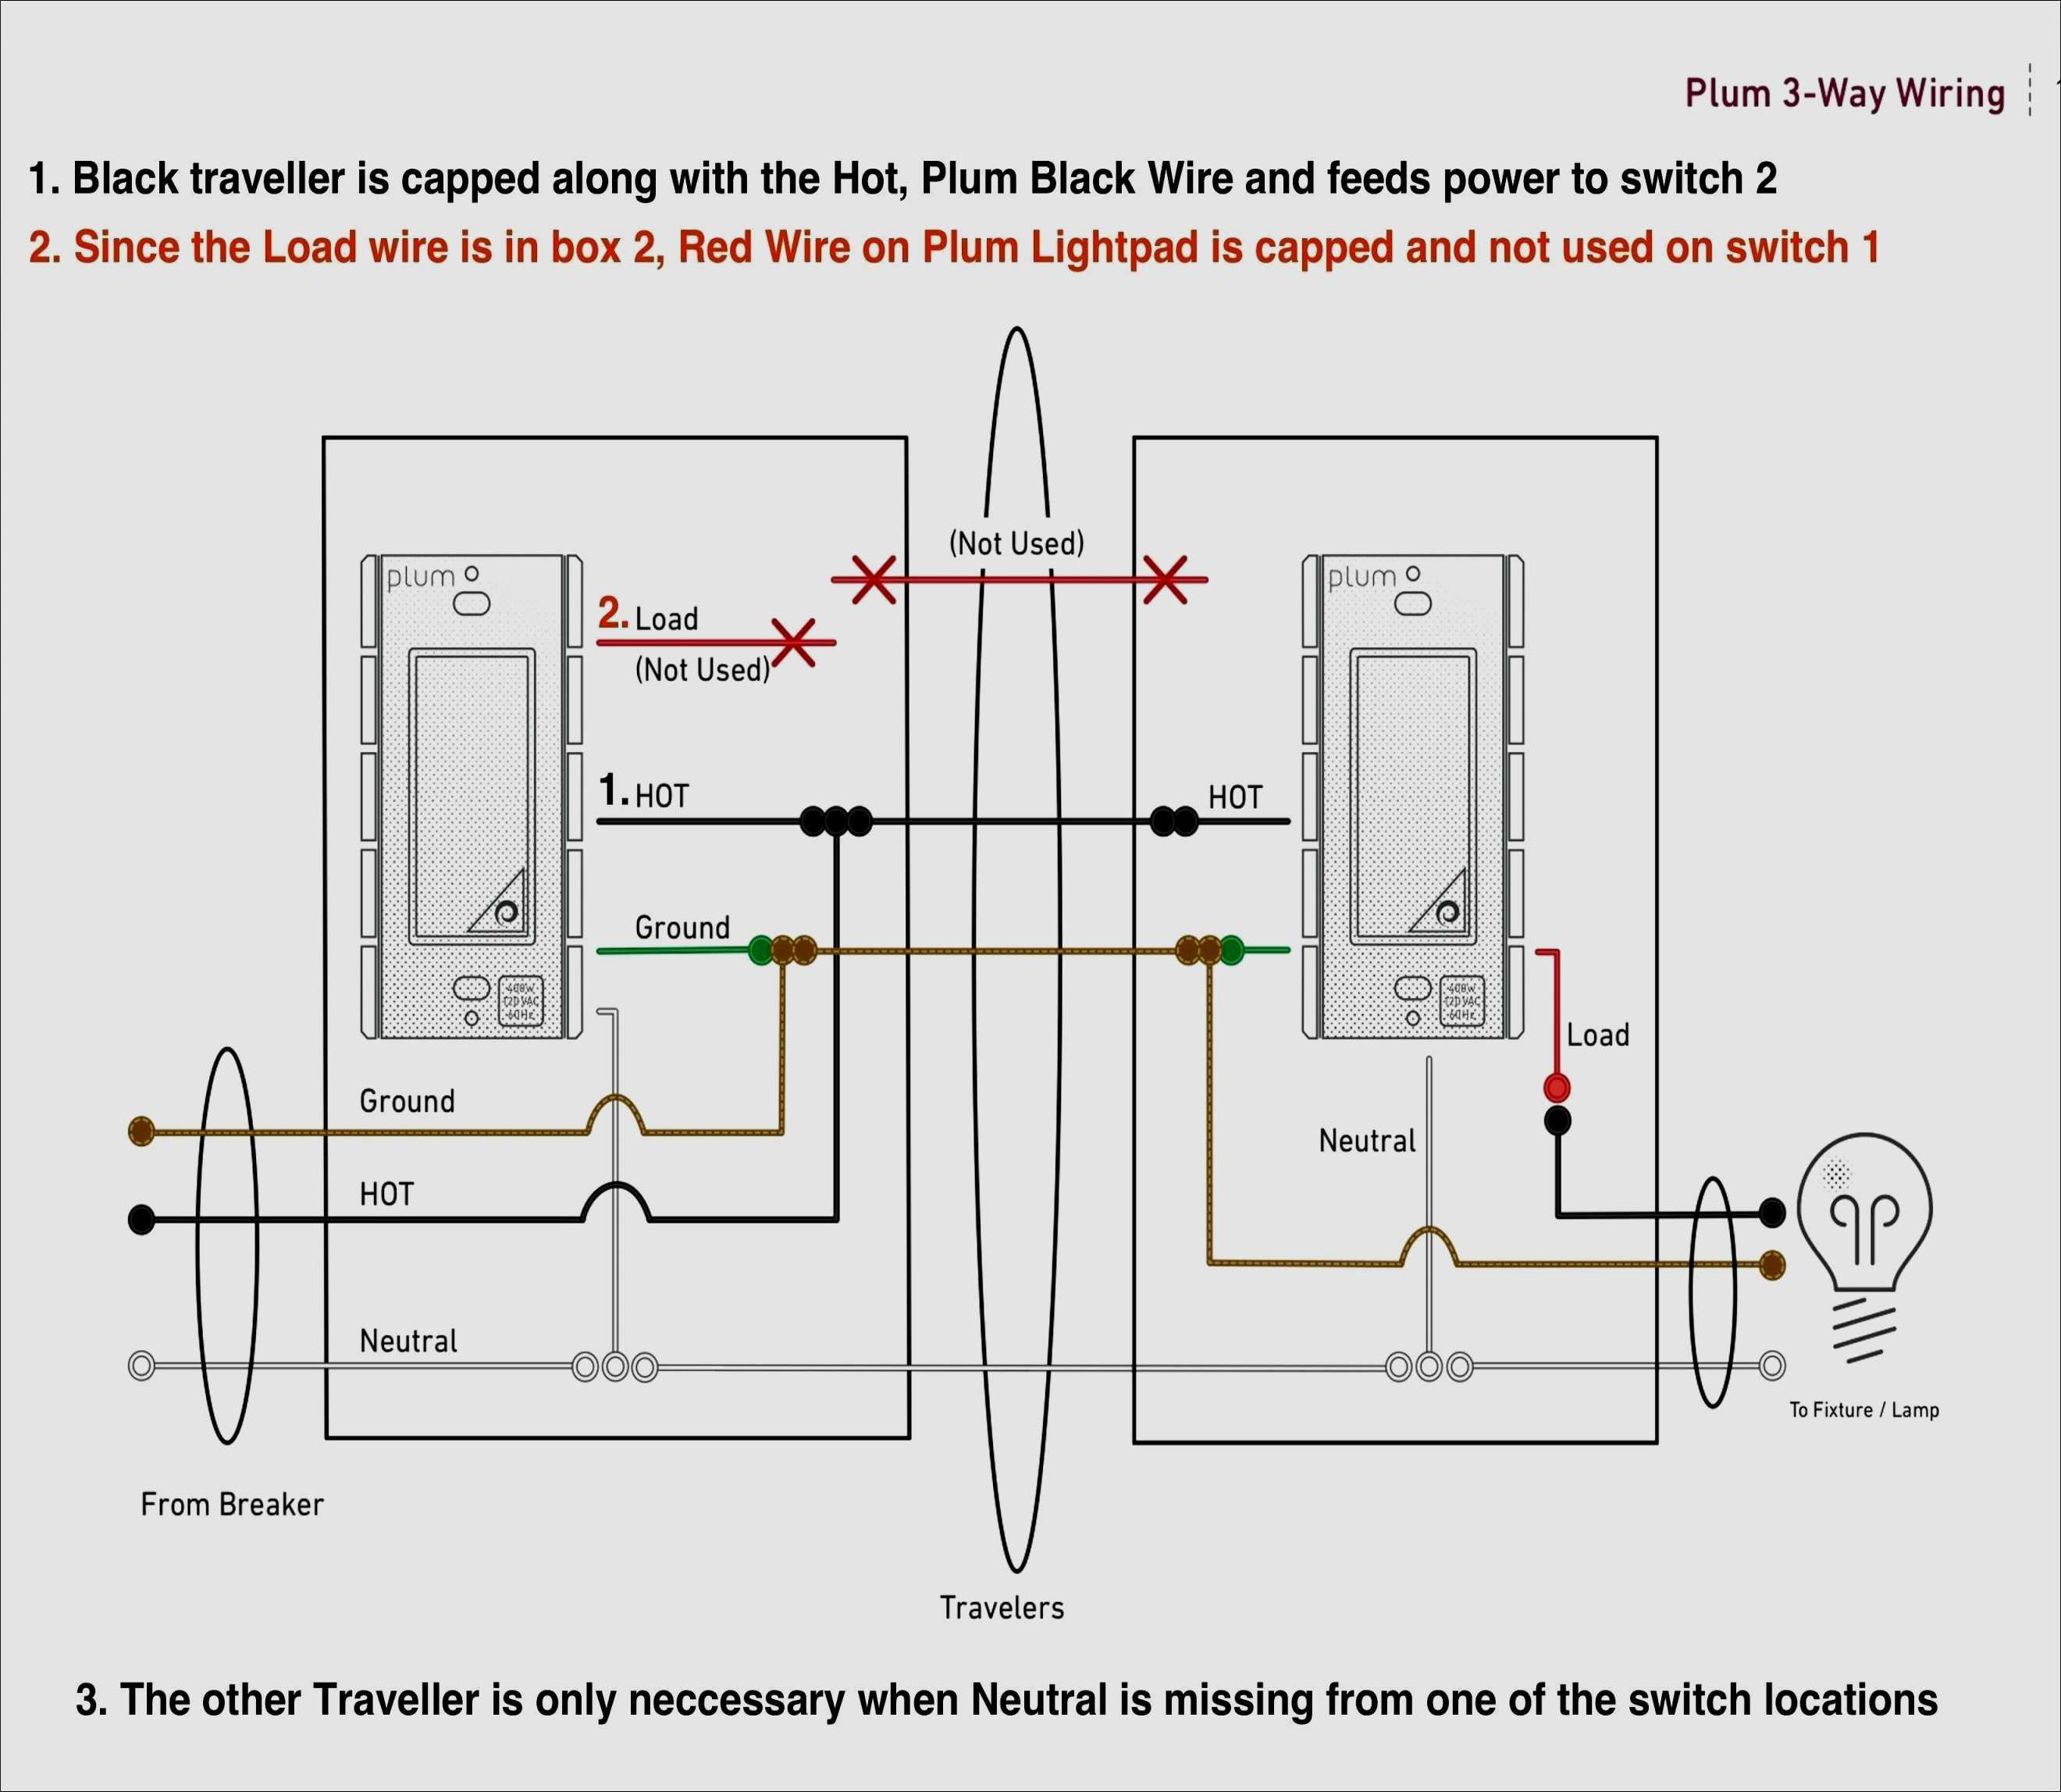 Lux Tx500E Thermostat Wiring Diagram | Manual E-Books - Lux Thermostat Wiring Diagram